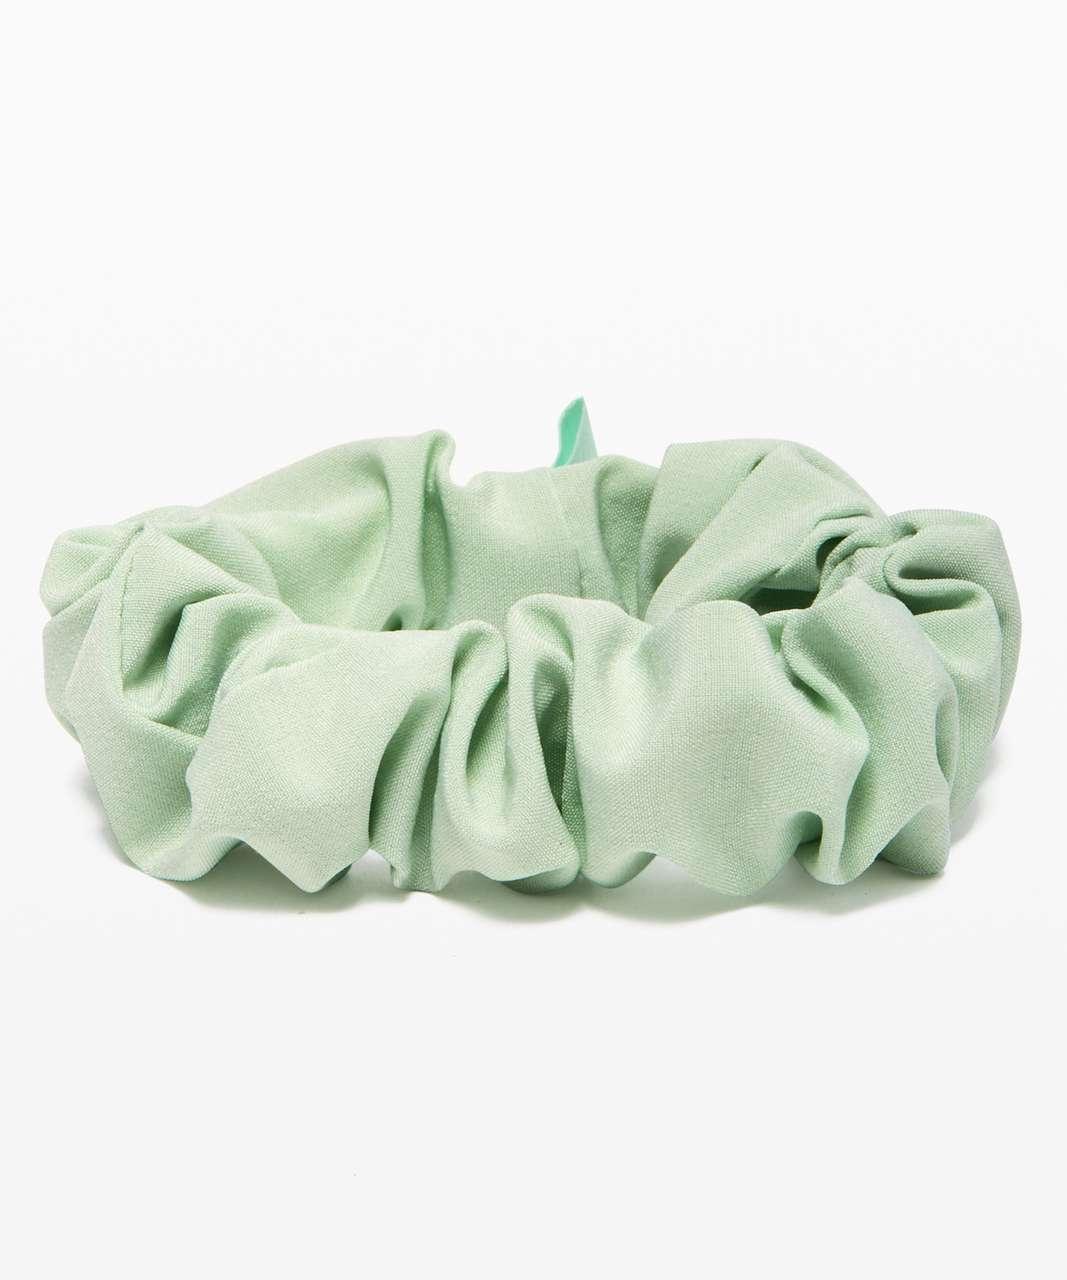 Lululemon Uplifting Scrunchie - Mystic Mint